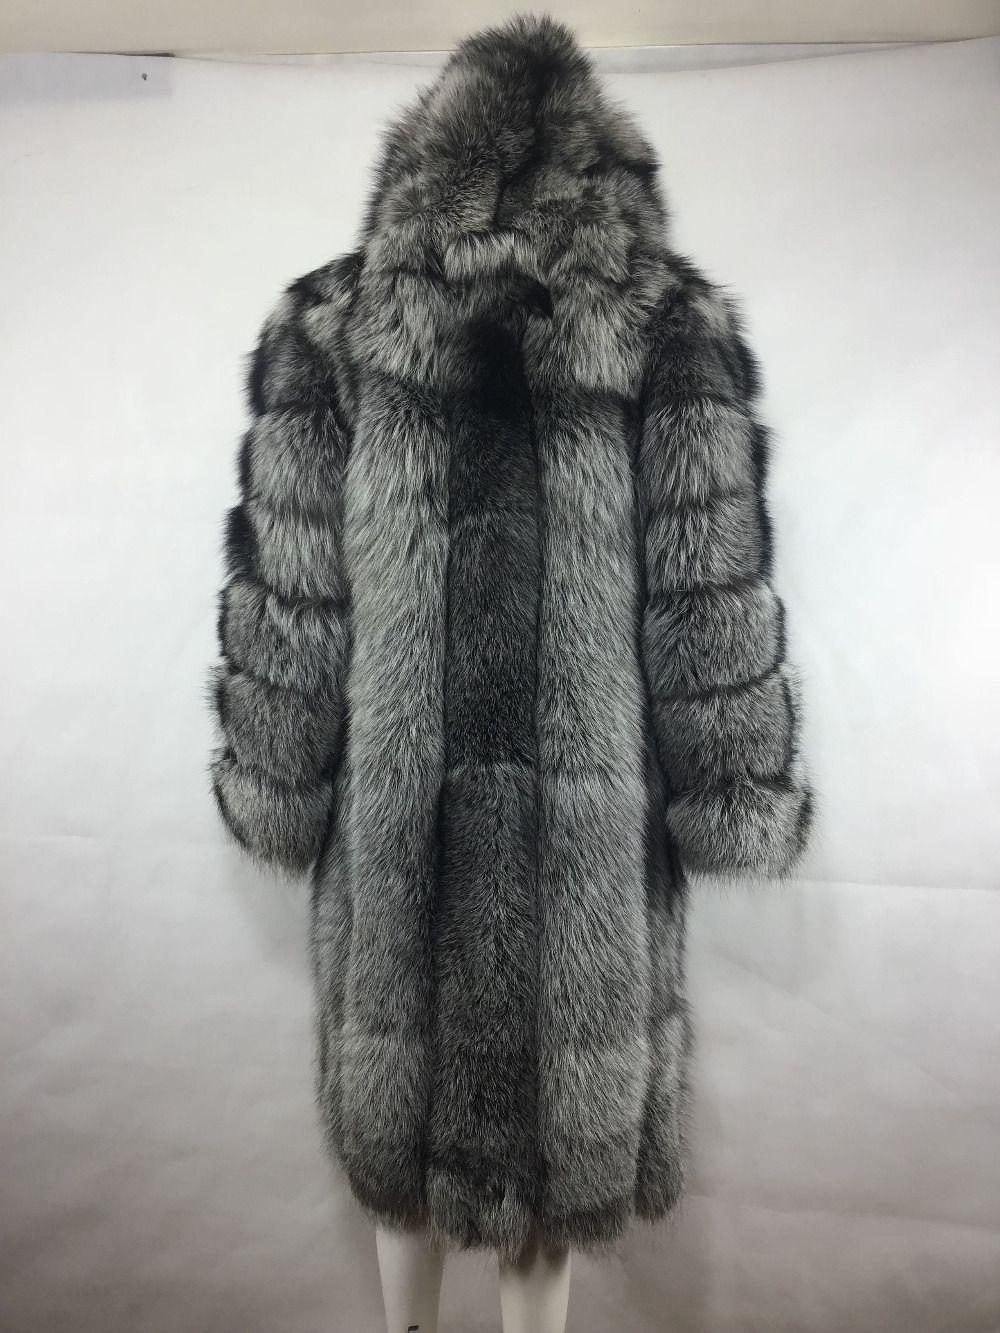 MLHXFUR 100 cm Lange Silber Fuchs Pelzmantel Kapuze Hoodie Mit Kapuze Mäntel für Frauen Mantel Outwear Parka Garment Plus Mantel topcoat